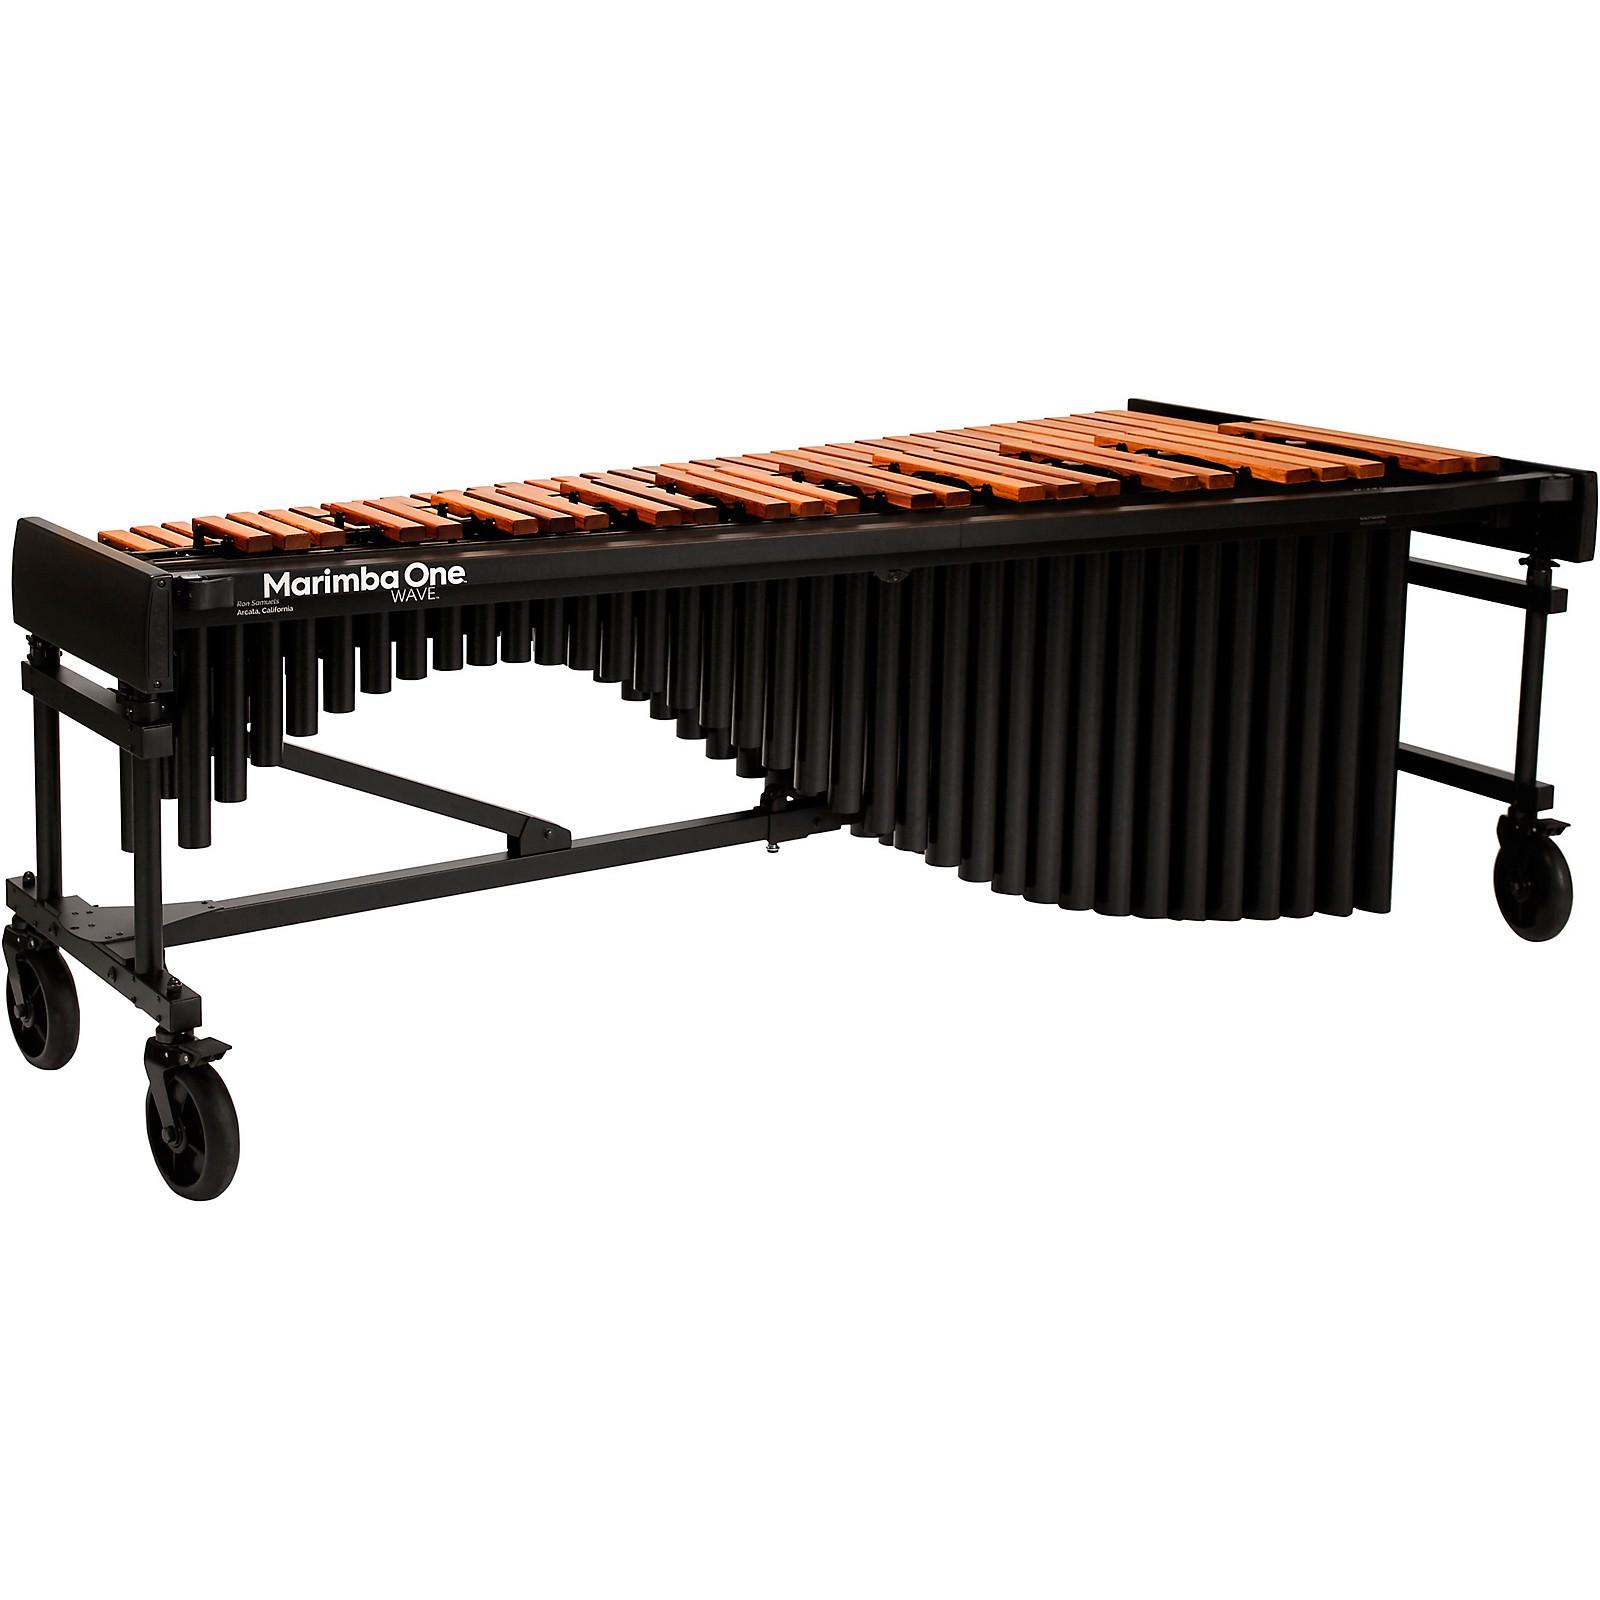 Marimba One Wave #9612 A442  5.0 Octave Marimba with Enhanced Keyboard and Classic Resonators 8